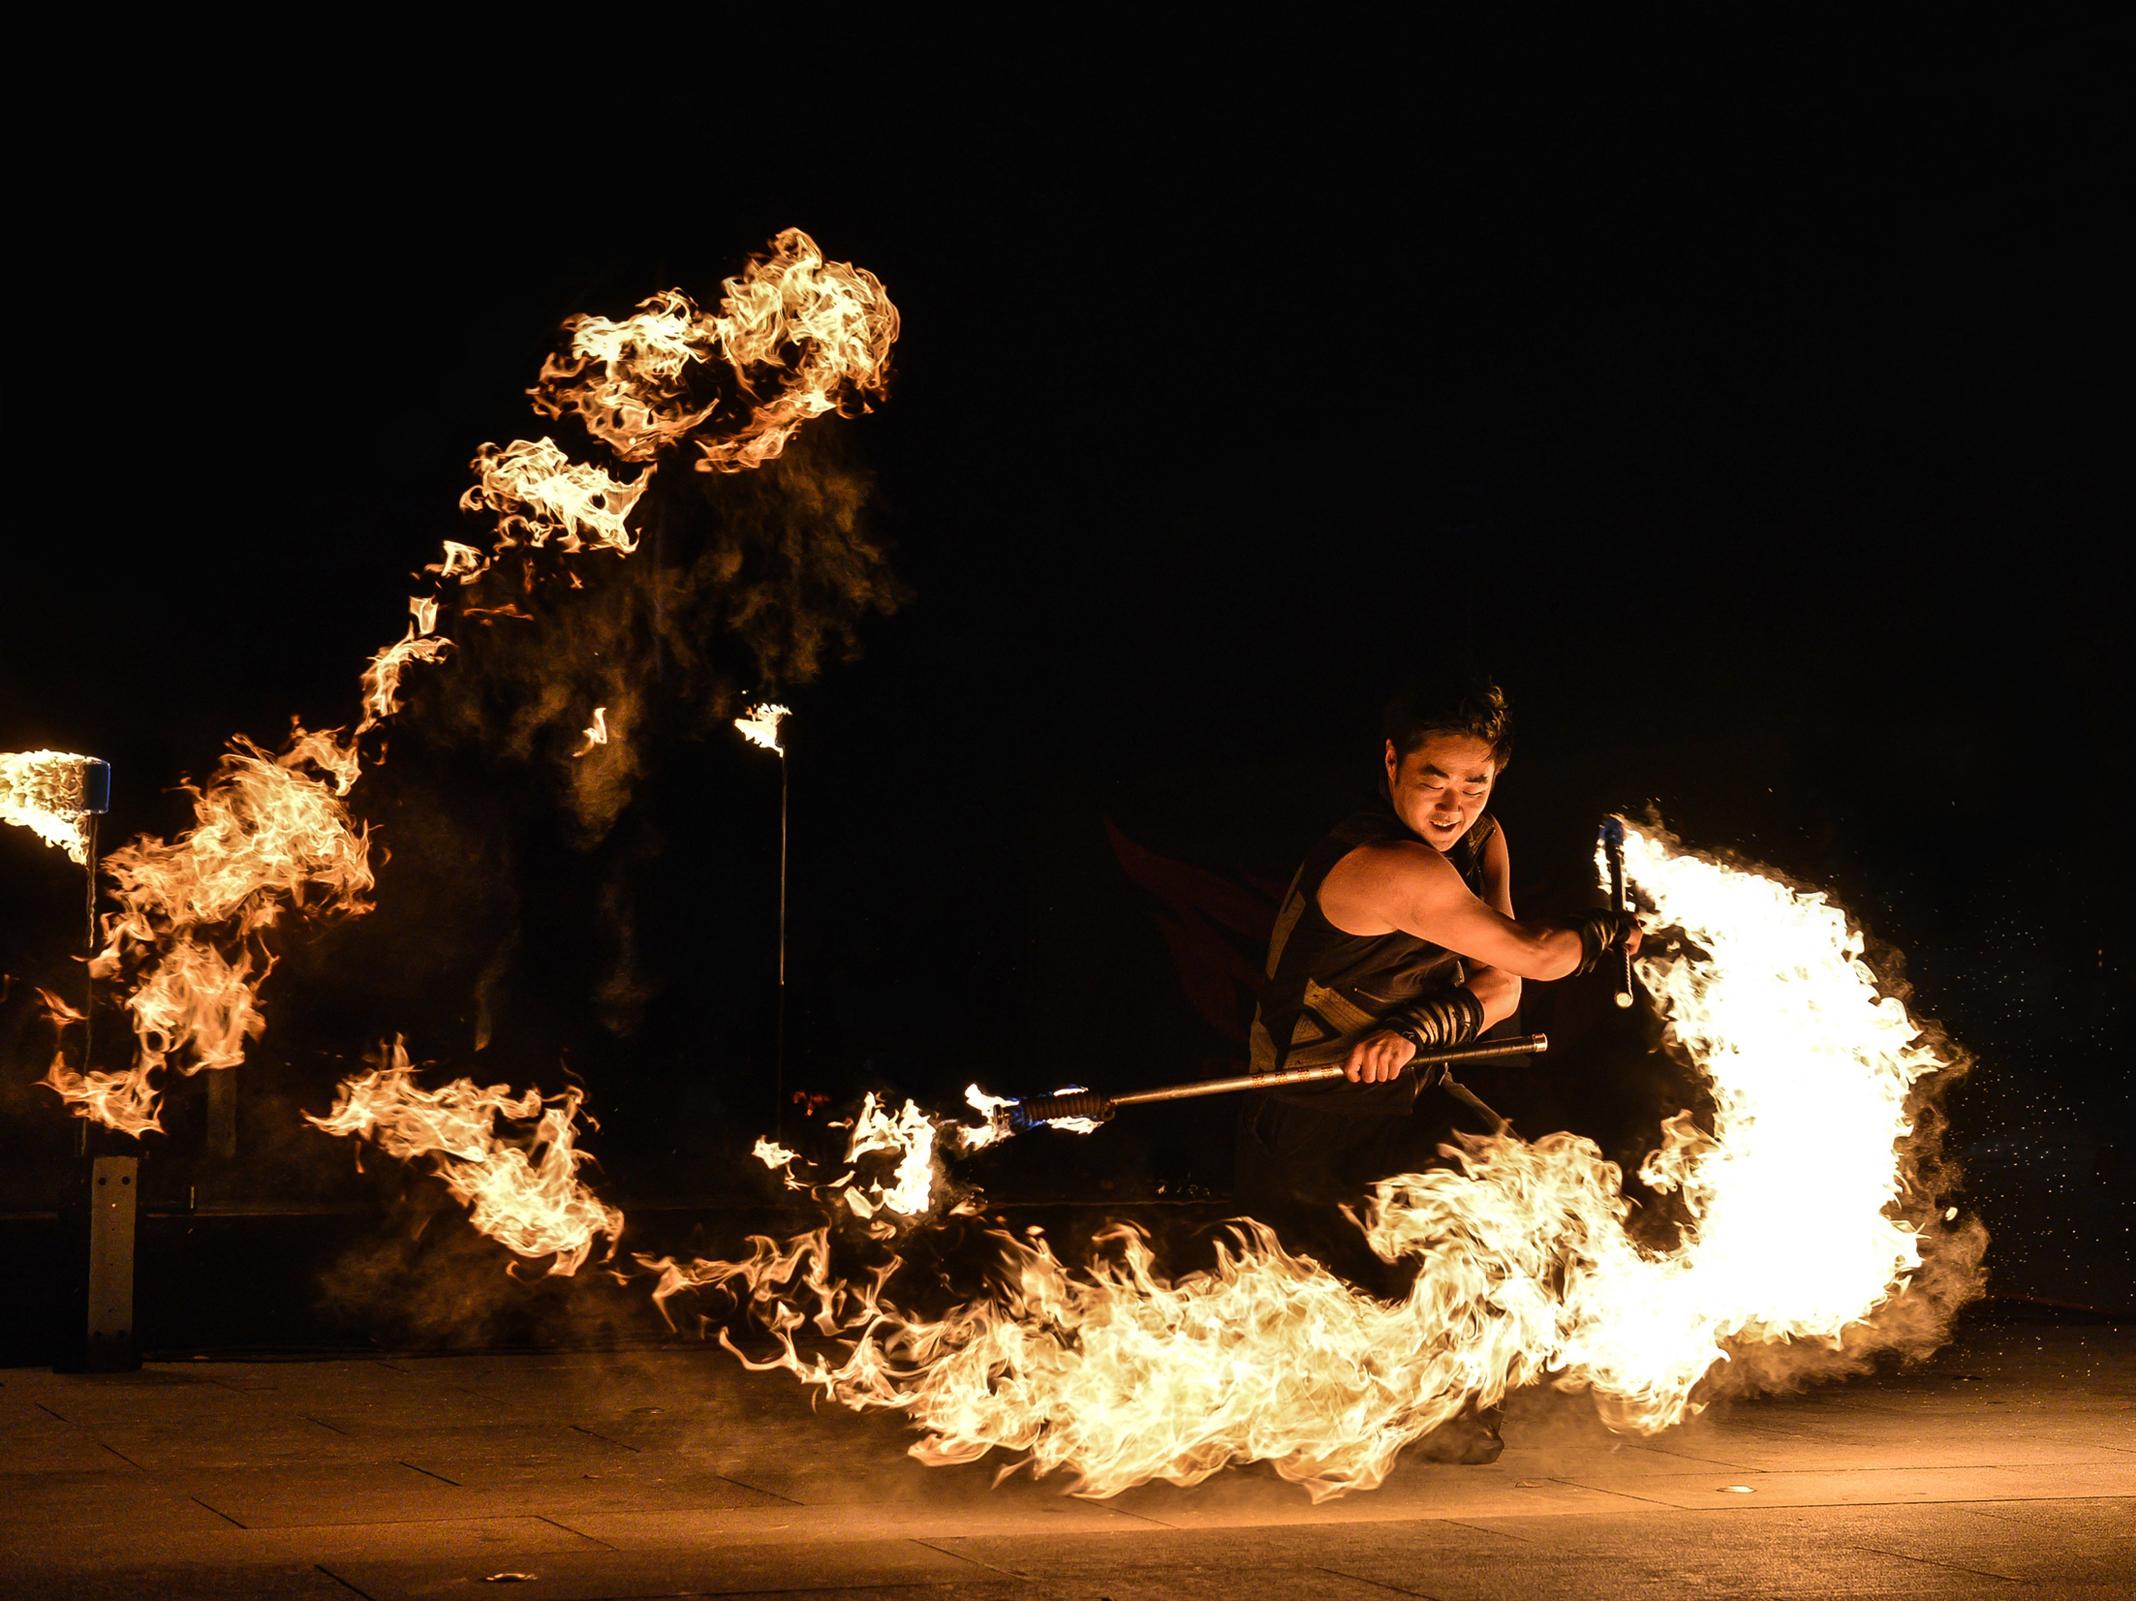 Fire Arts_Flaming Fire team_leeroy (2)